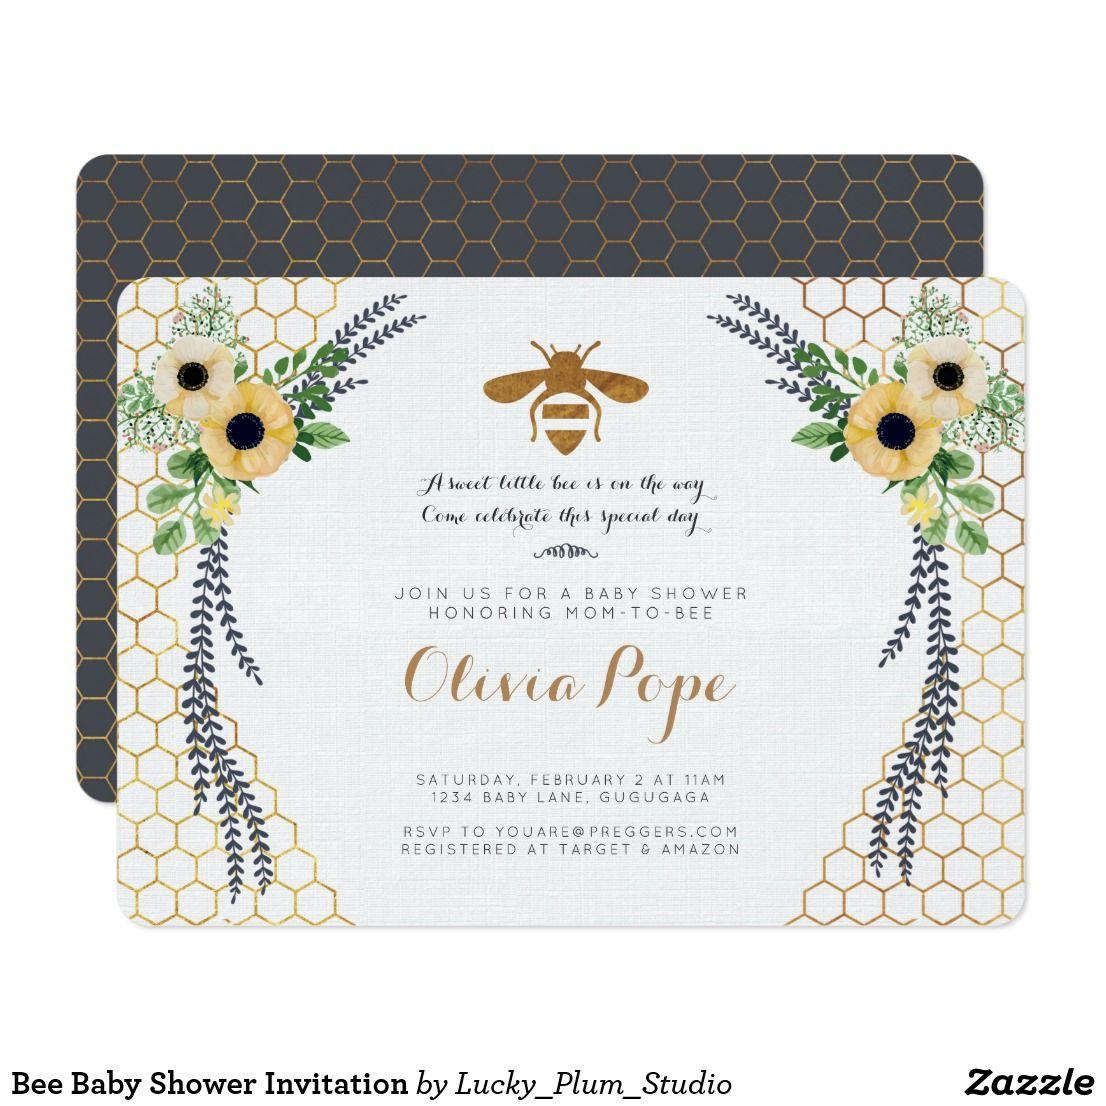 Bee Baby Shower Invitation   BaBy-Que   Pinterest   Shower invitations